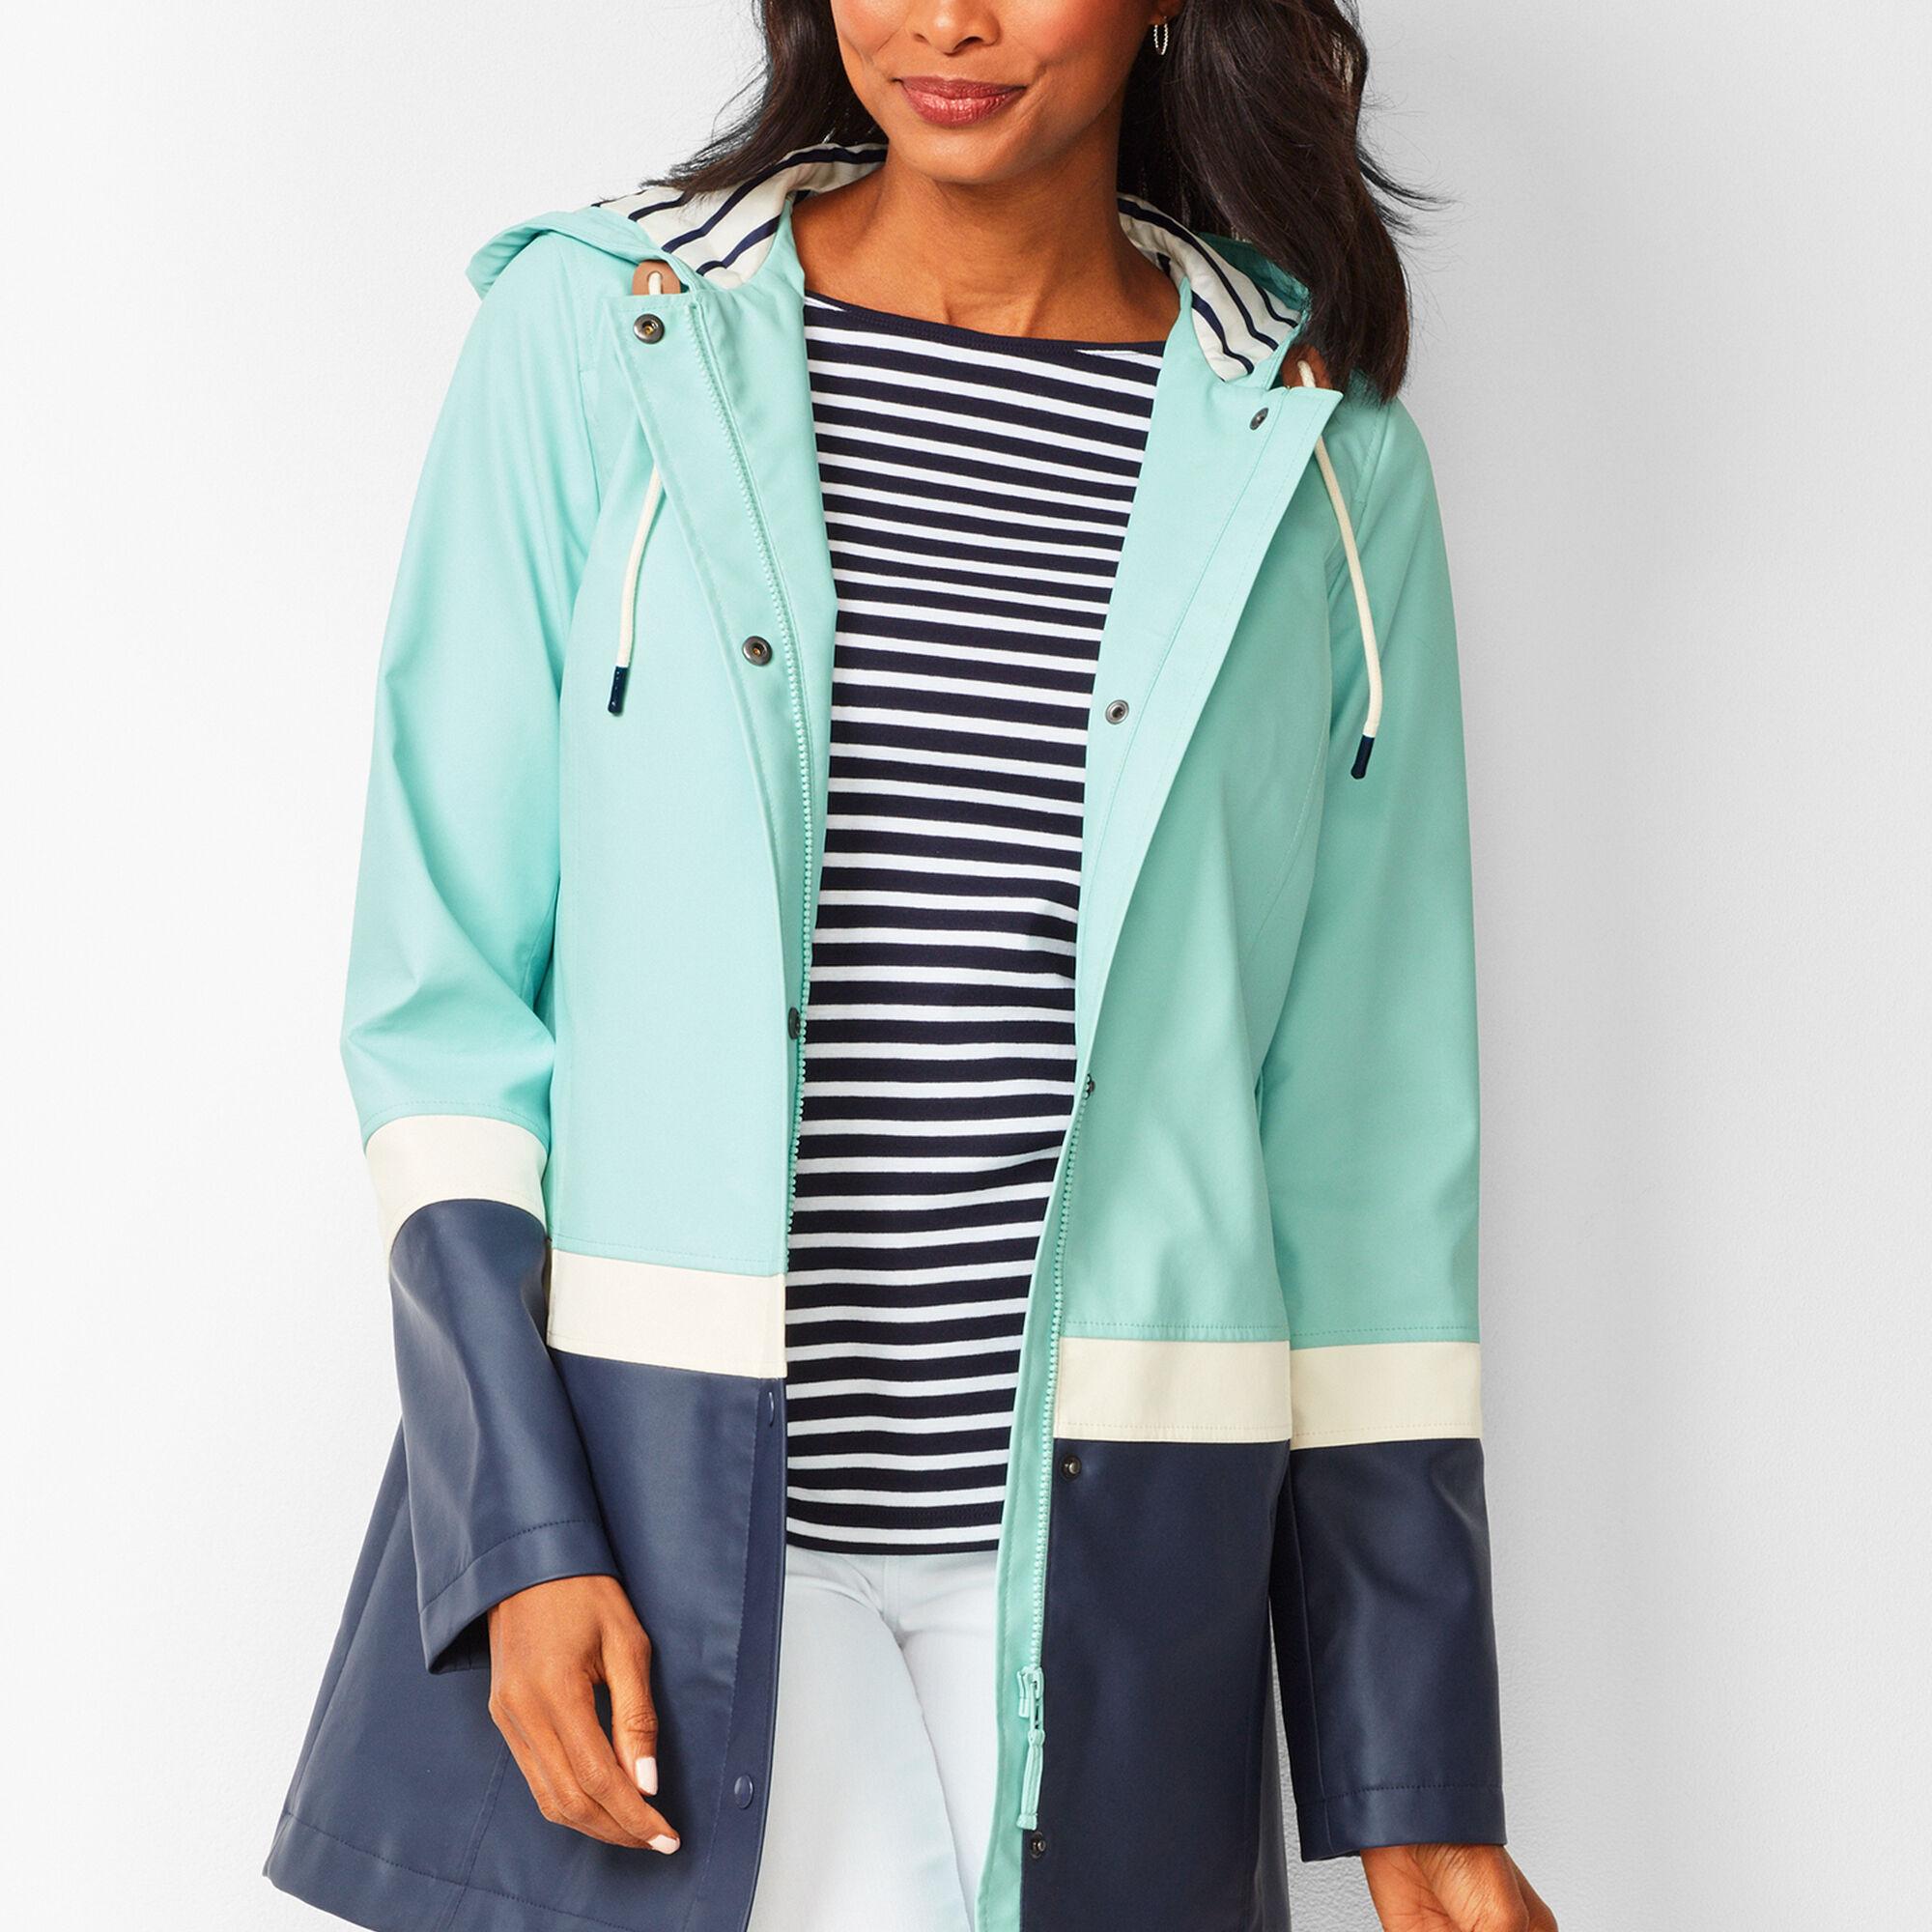 f499ae9468b1 Colorblock Hooded Raincoat